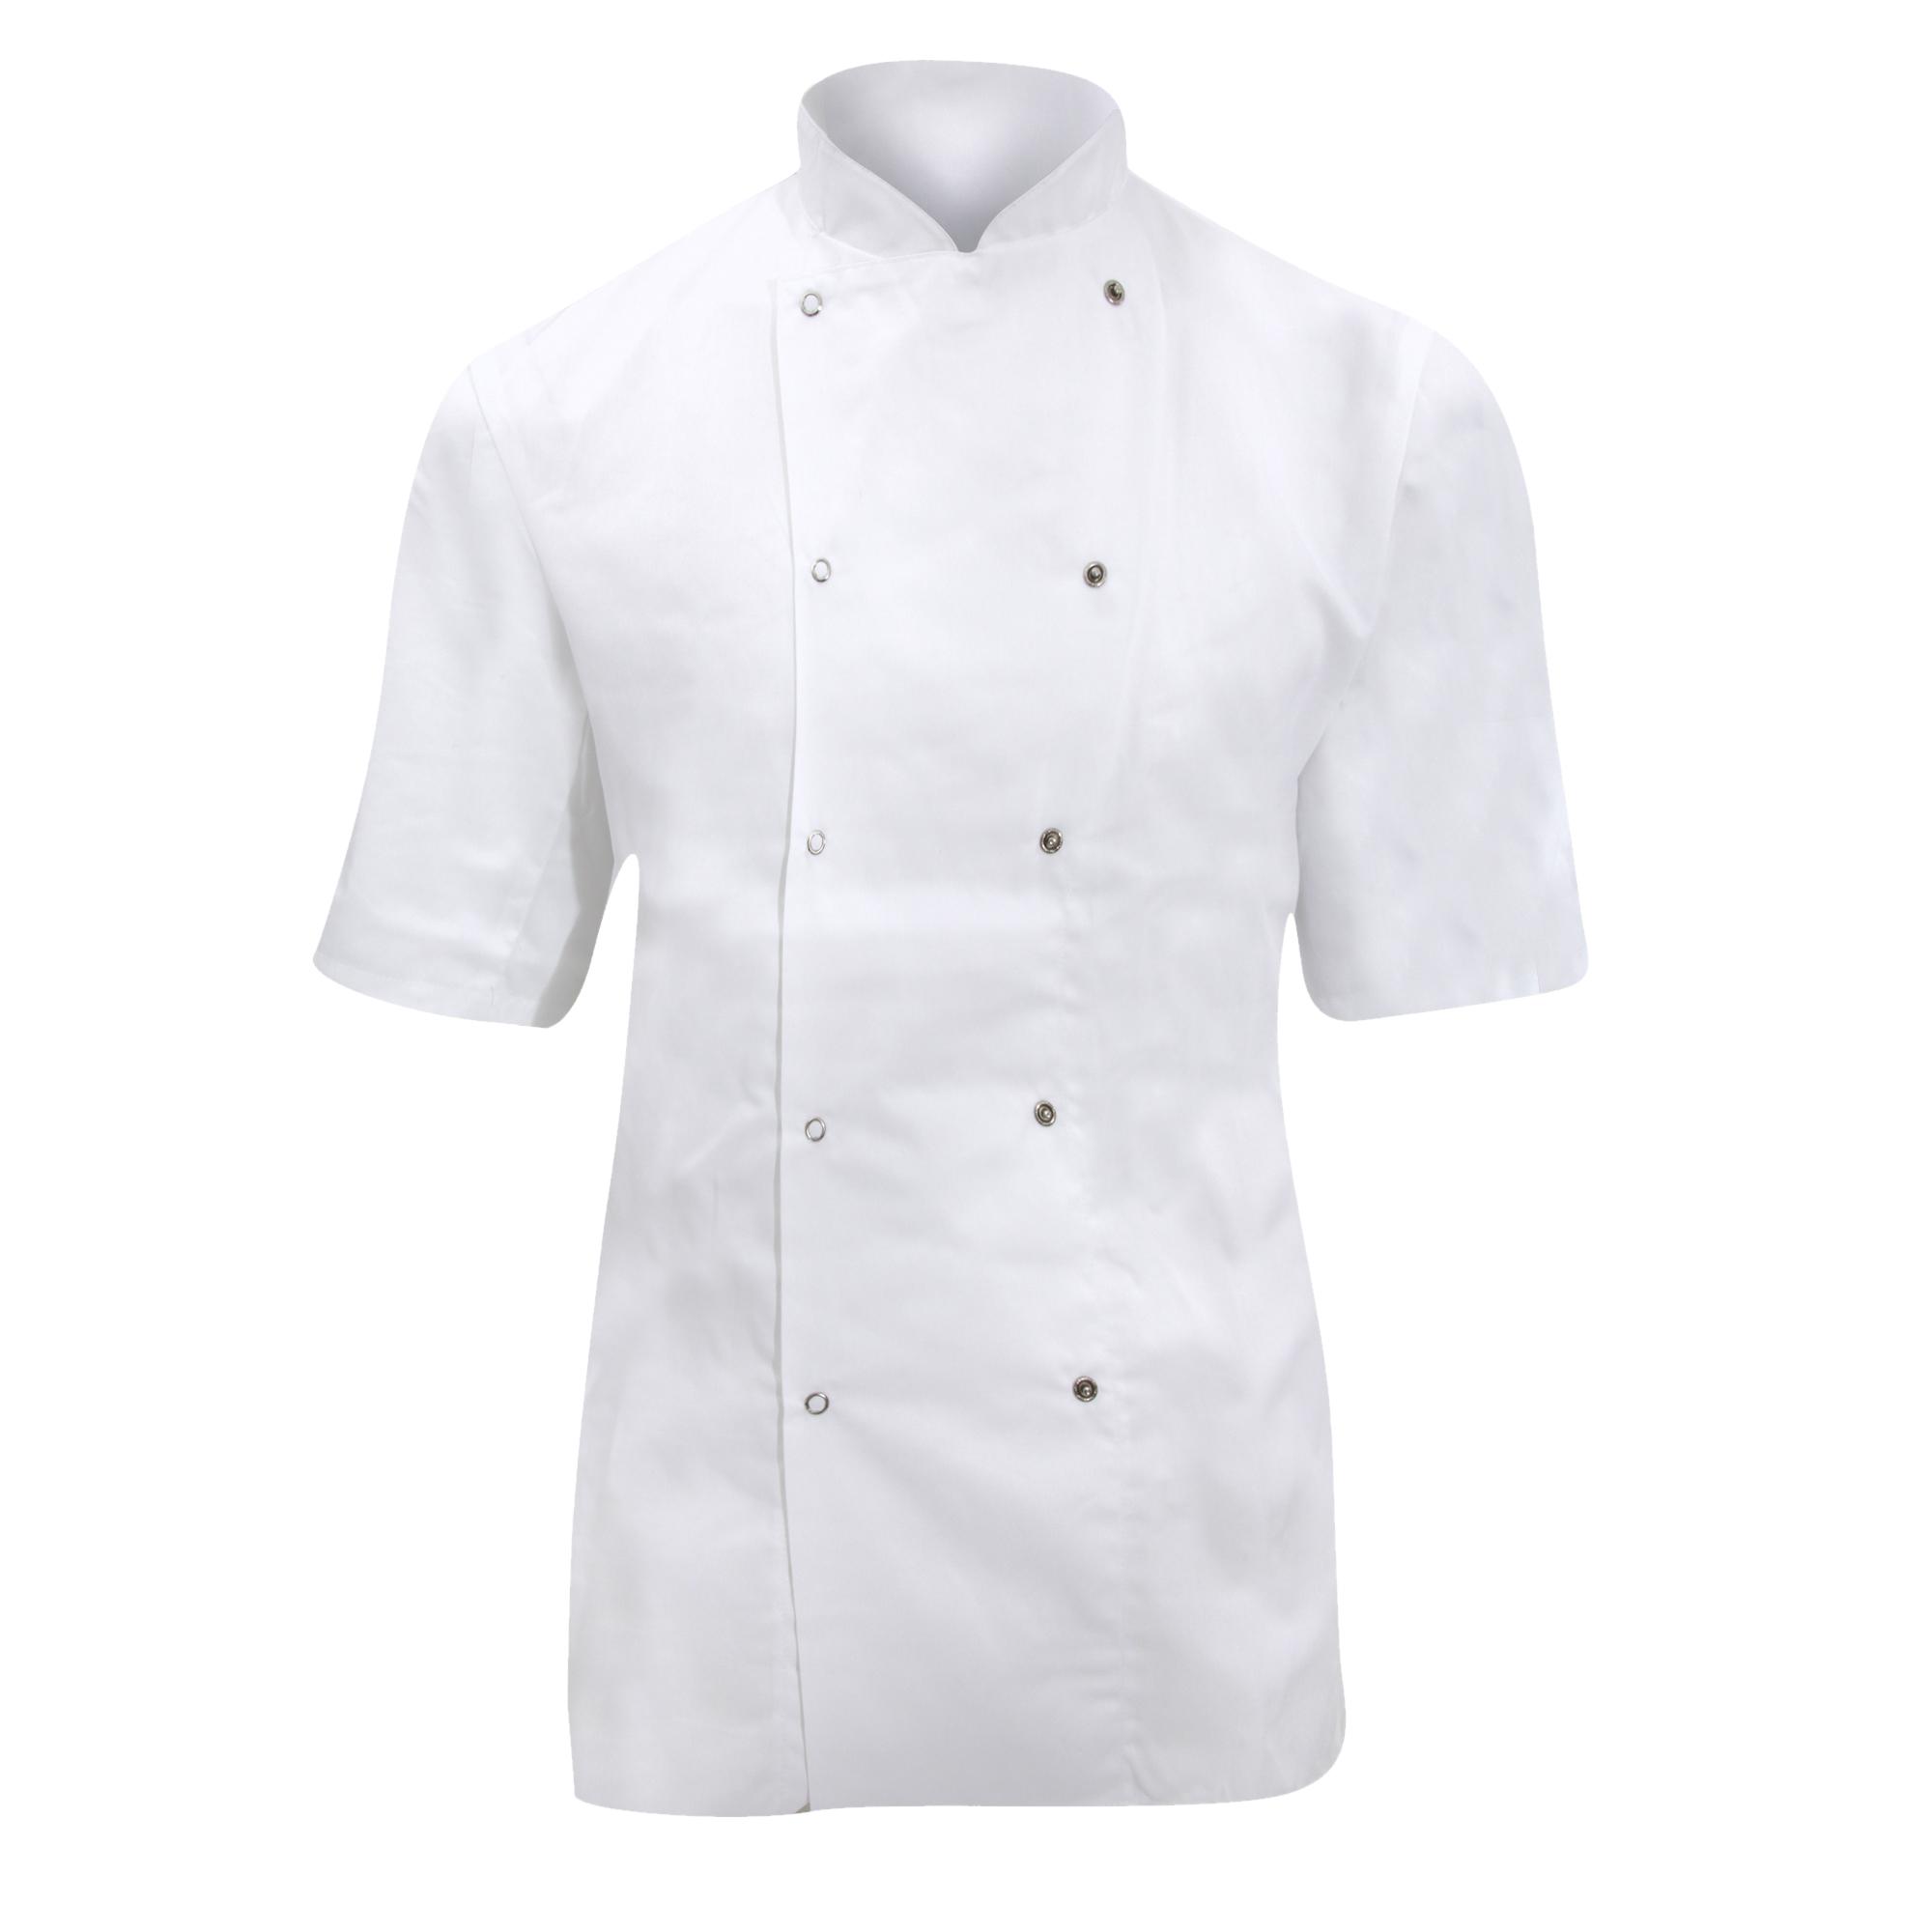 Dennys Ladies/Womens Short Sleeve Chefs Jacket / Chefswear (S) (White)